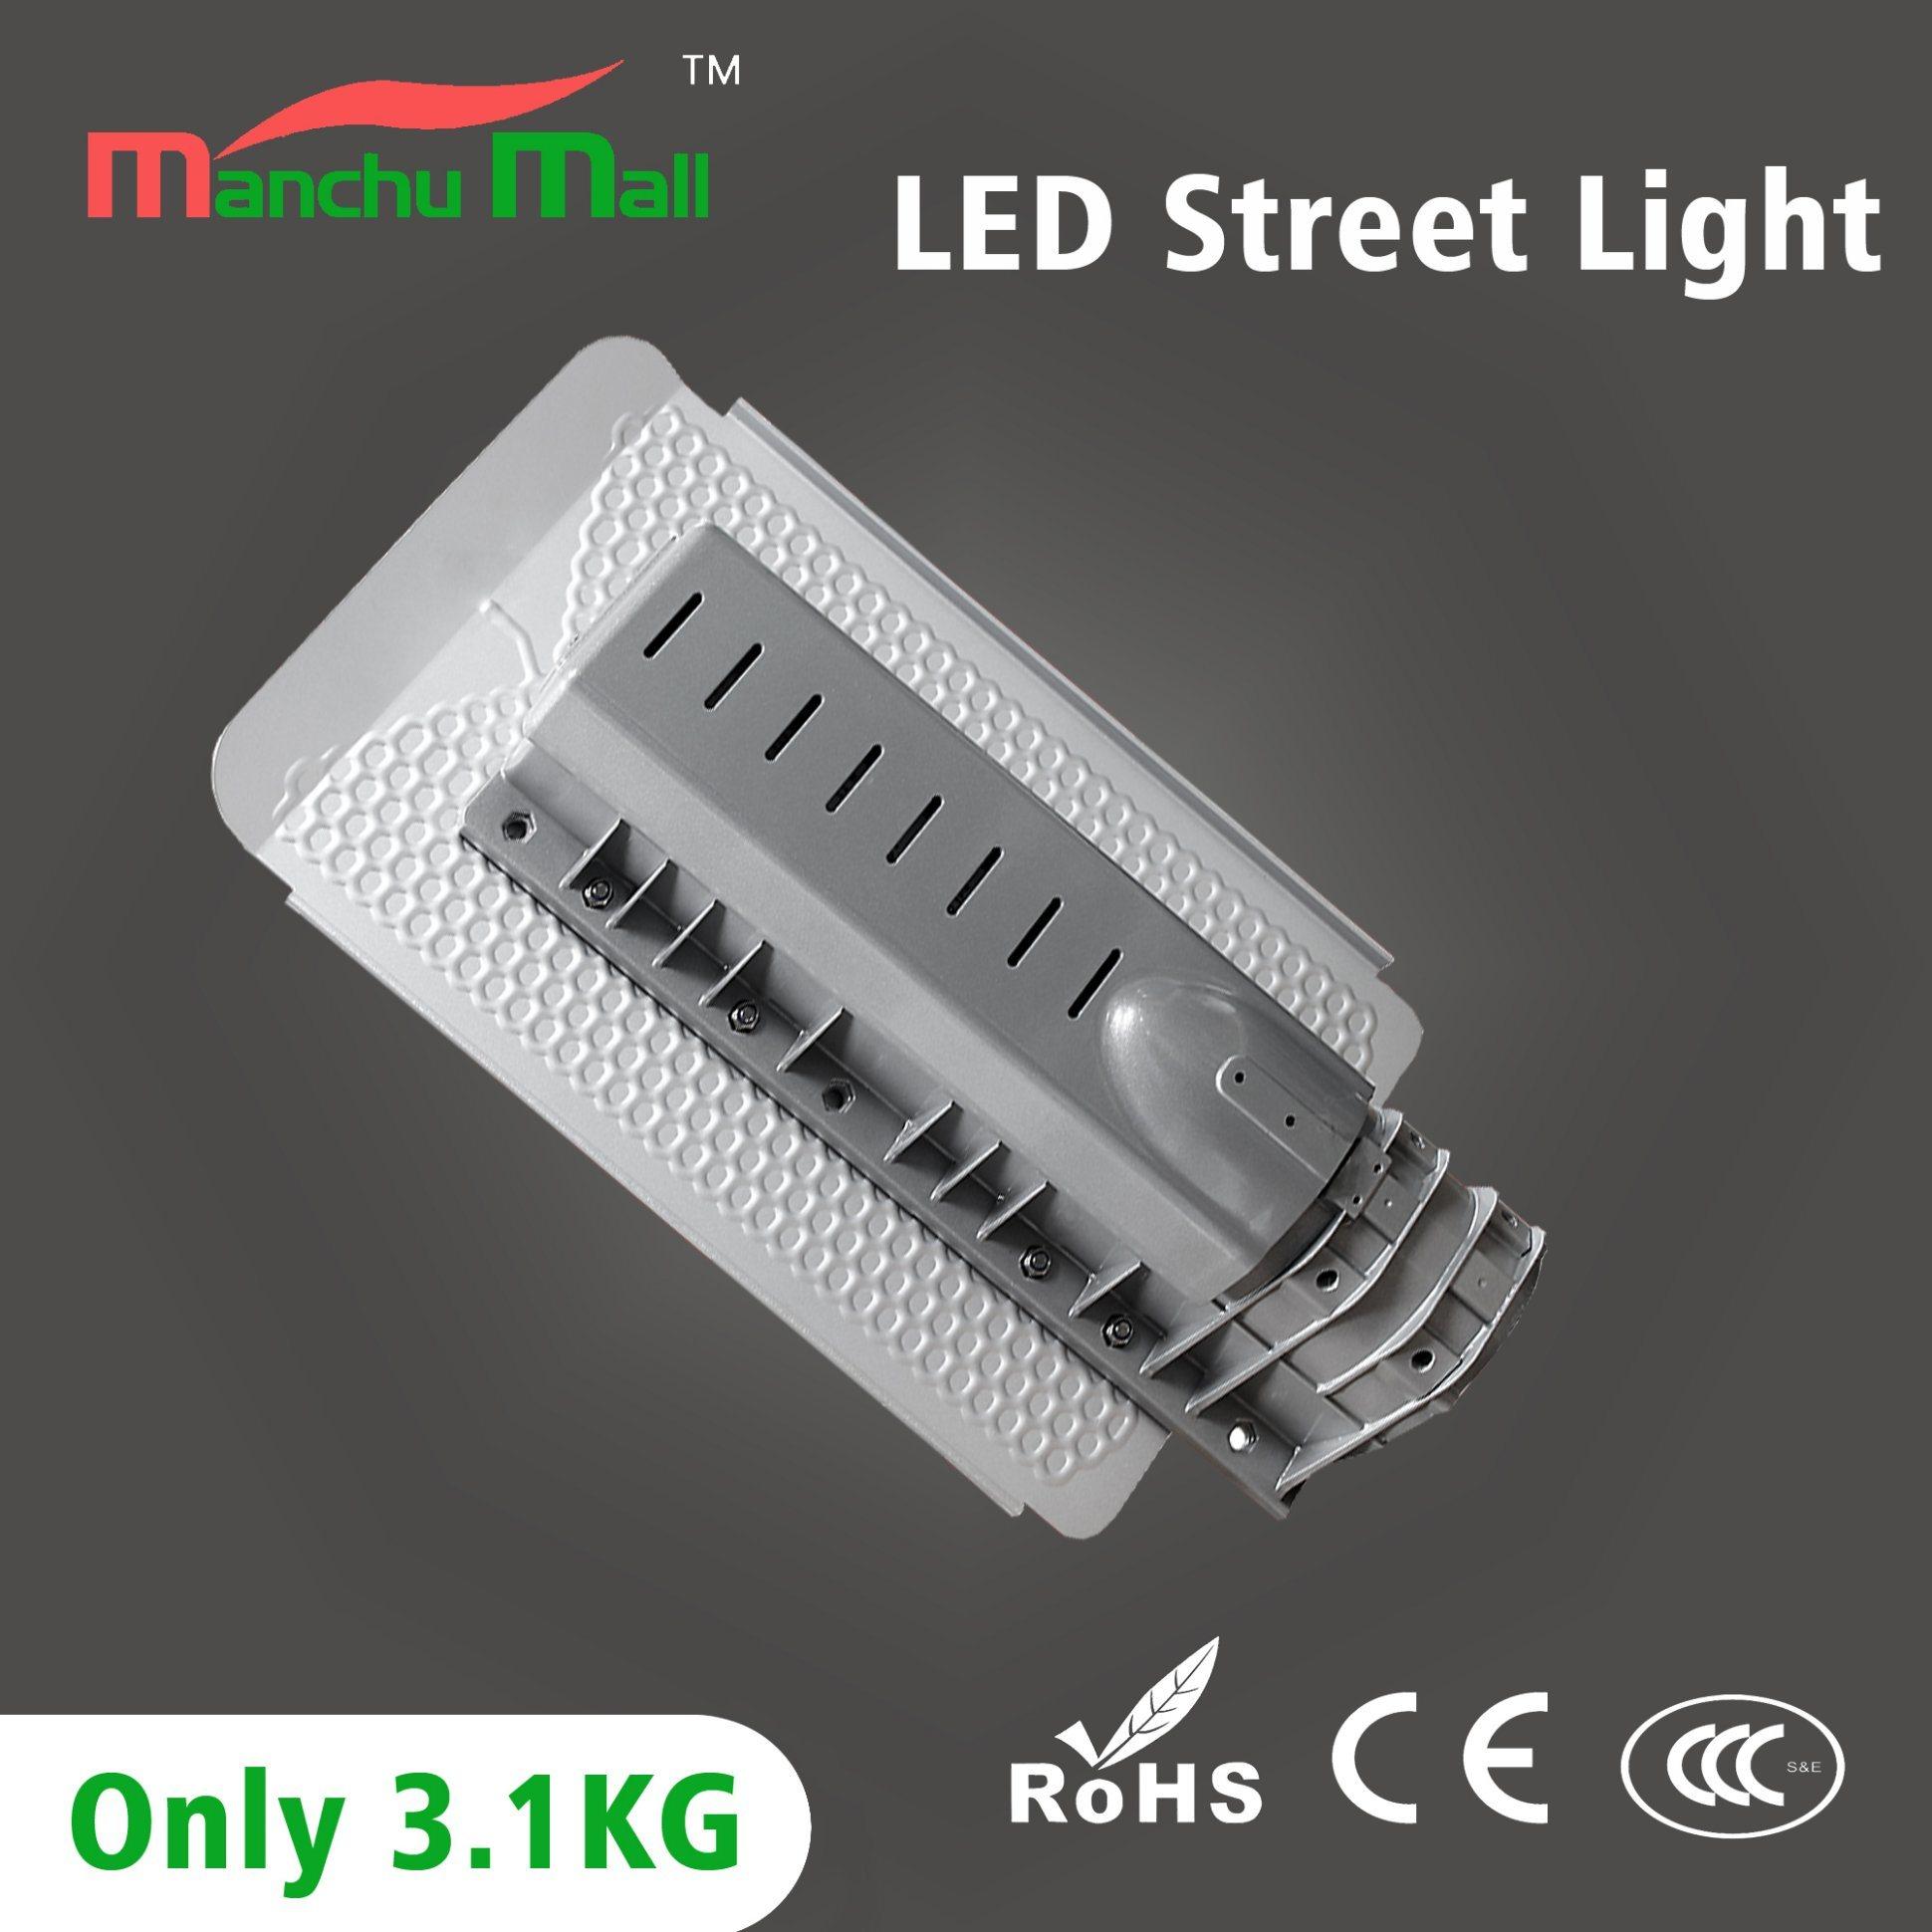 100watt Professional High Lumen Bridgelux Chip LED Street Lamp